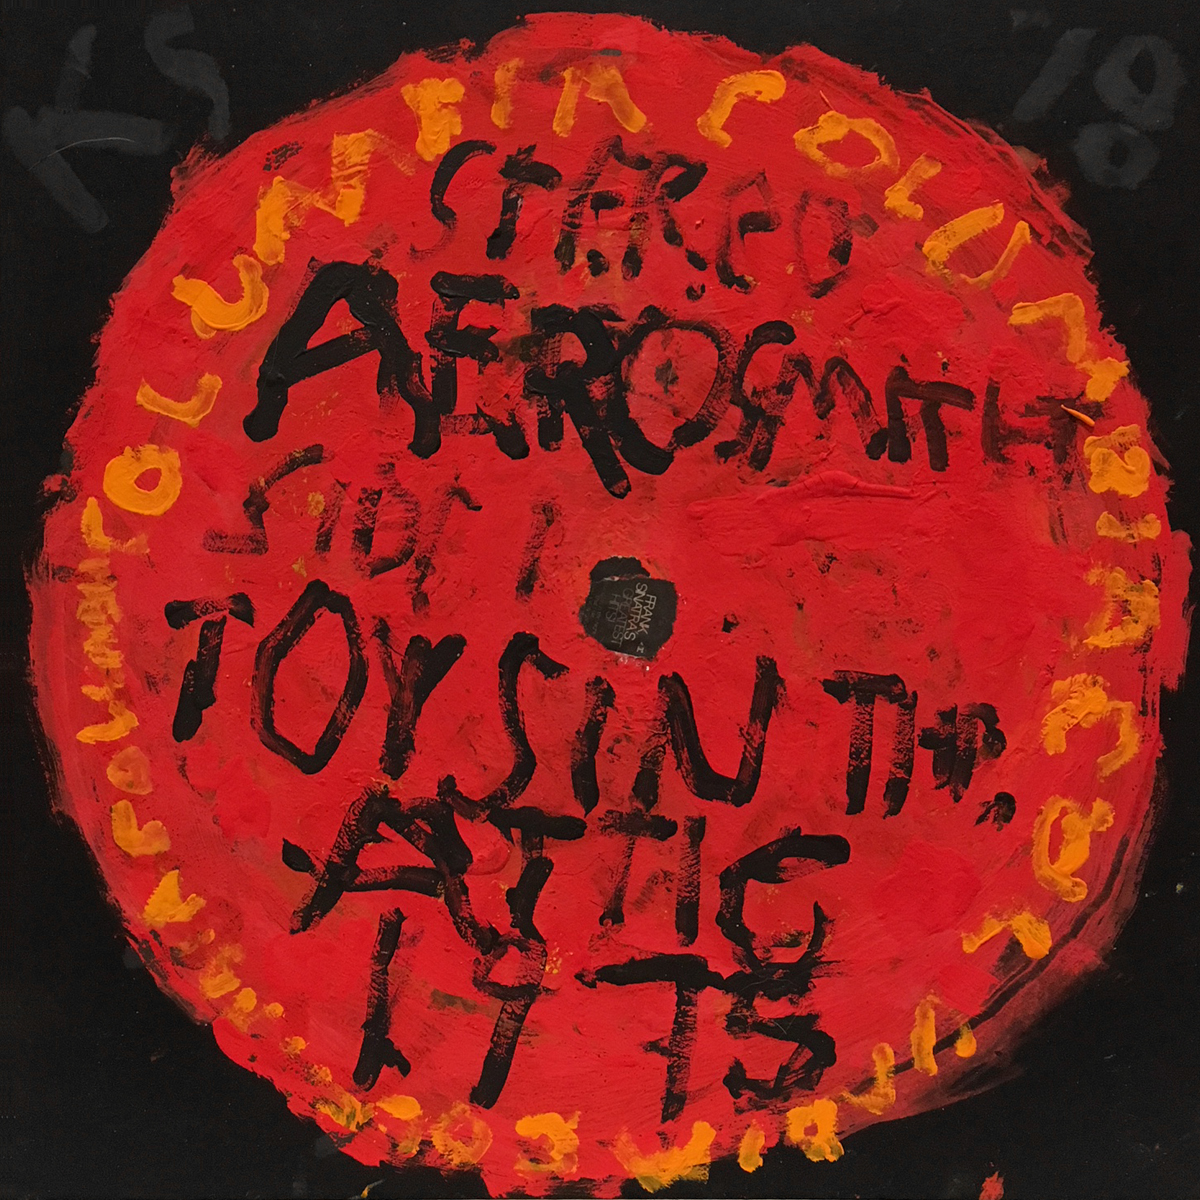 Aerosmith / Toys in the attic